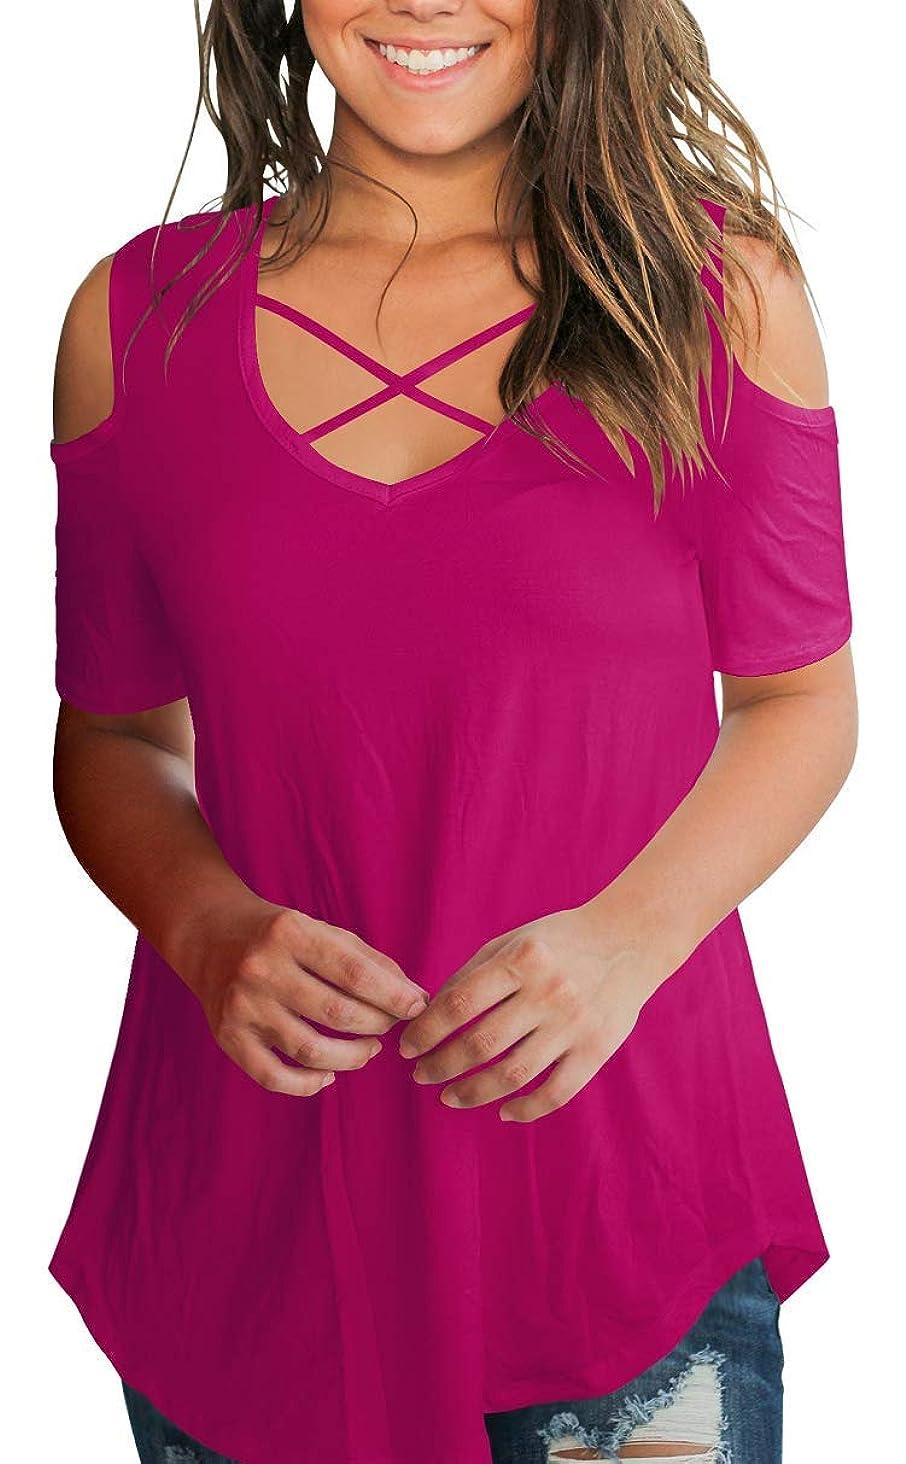 SMALNNIE Women's Criss Cross Cold Shoulder V Neck Short Sleeve Summer T Shirts